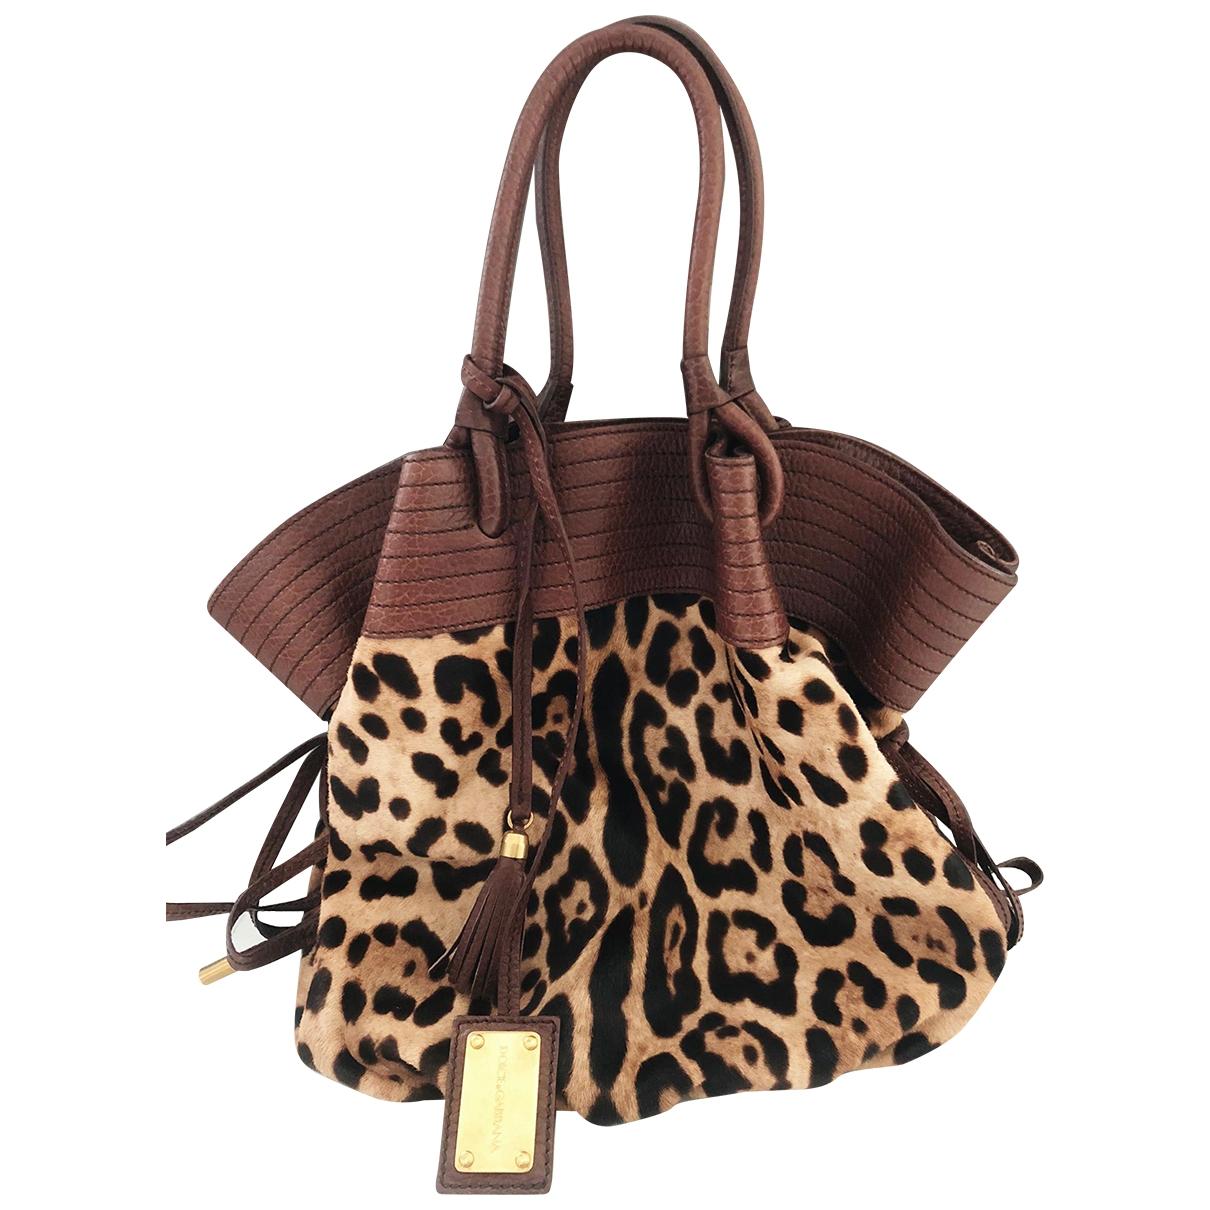 Dolce & Gabbana \N Brown Pony-style calfskin handbag for Women \N